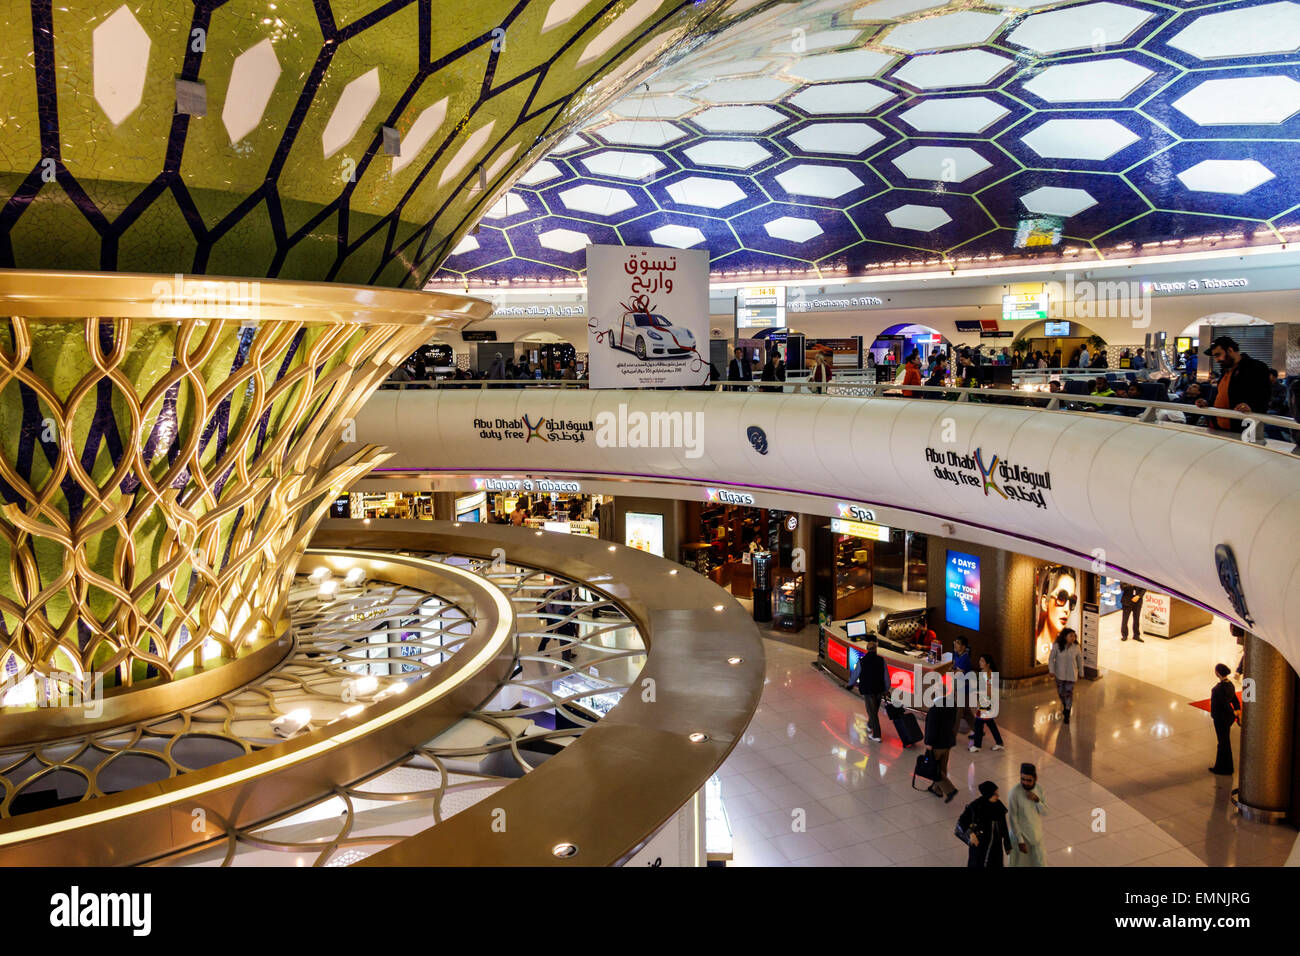 Duty free shop airport from stock photos duty free shop for International decor company abu dhabi